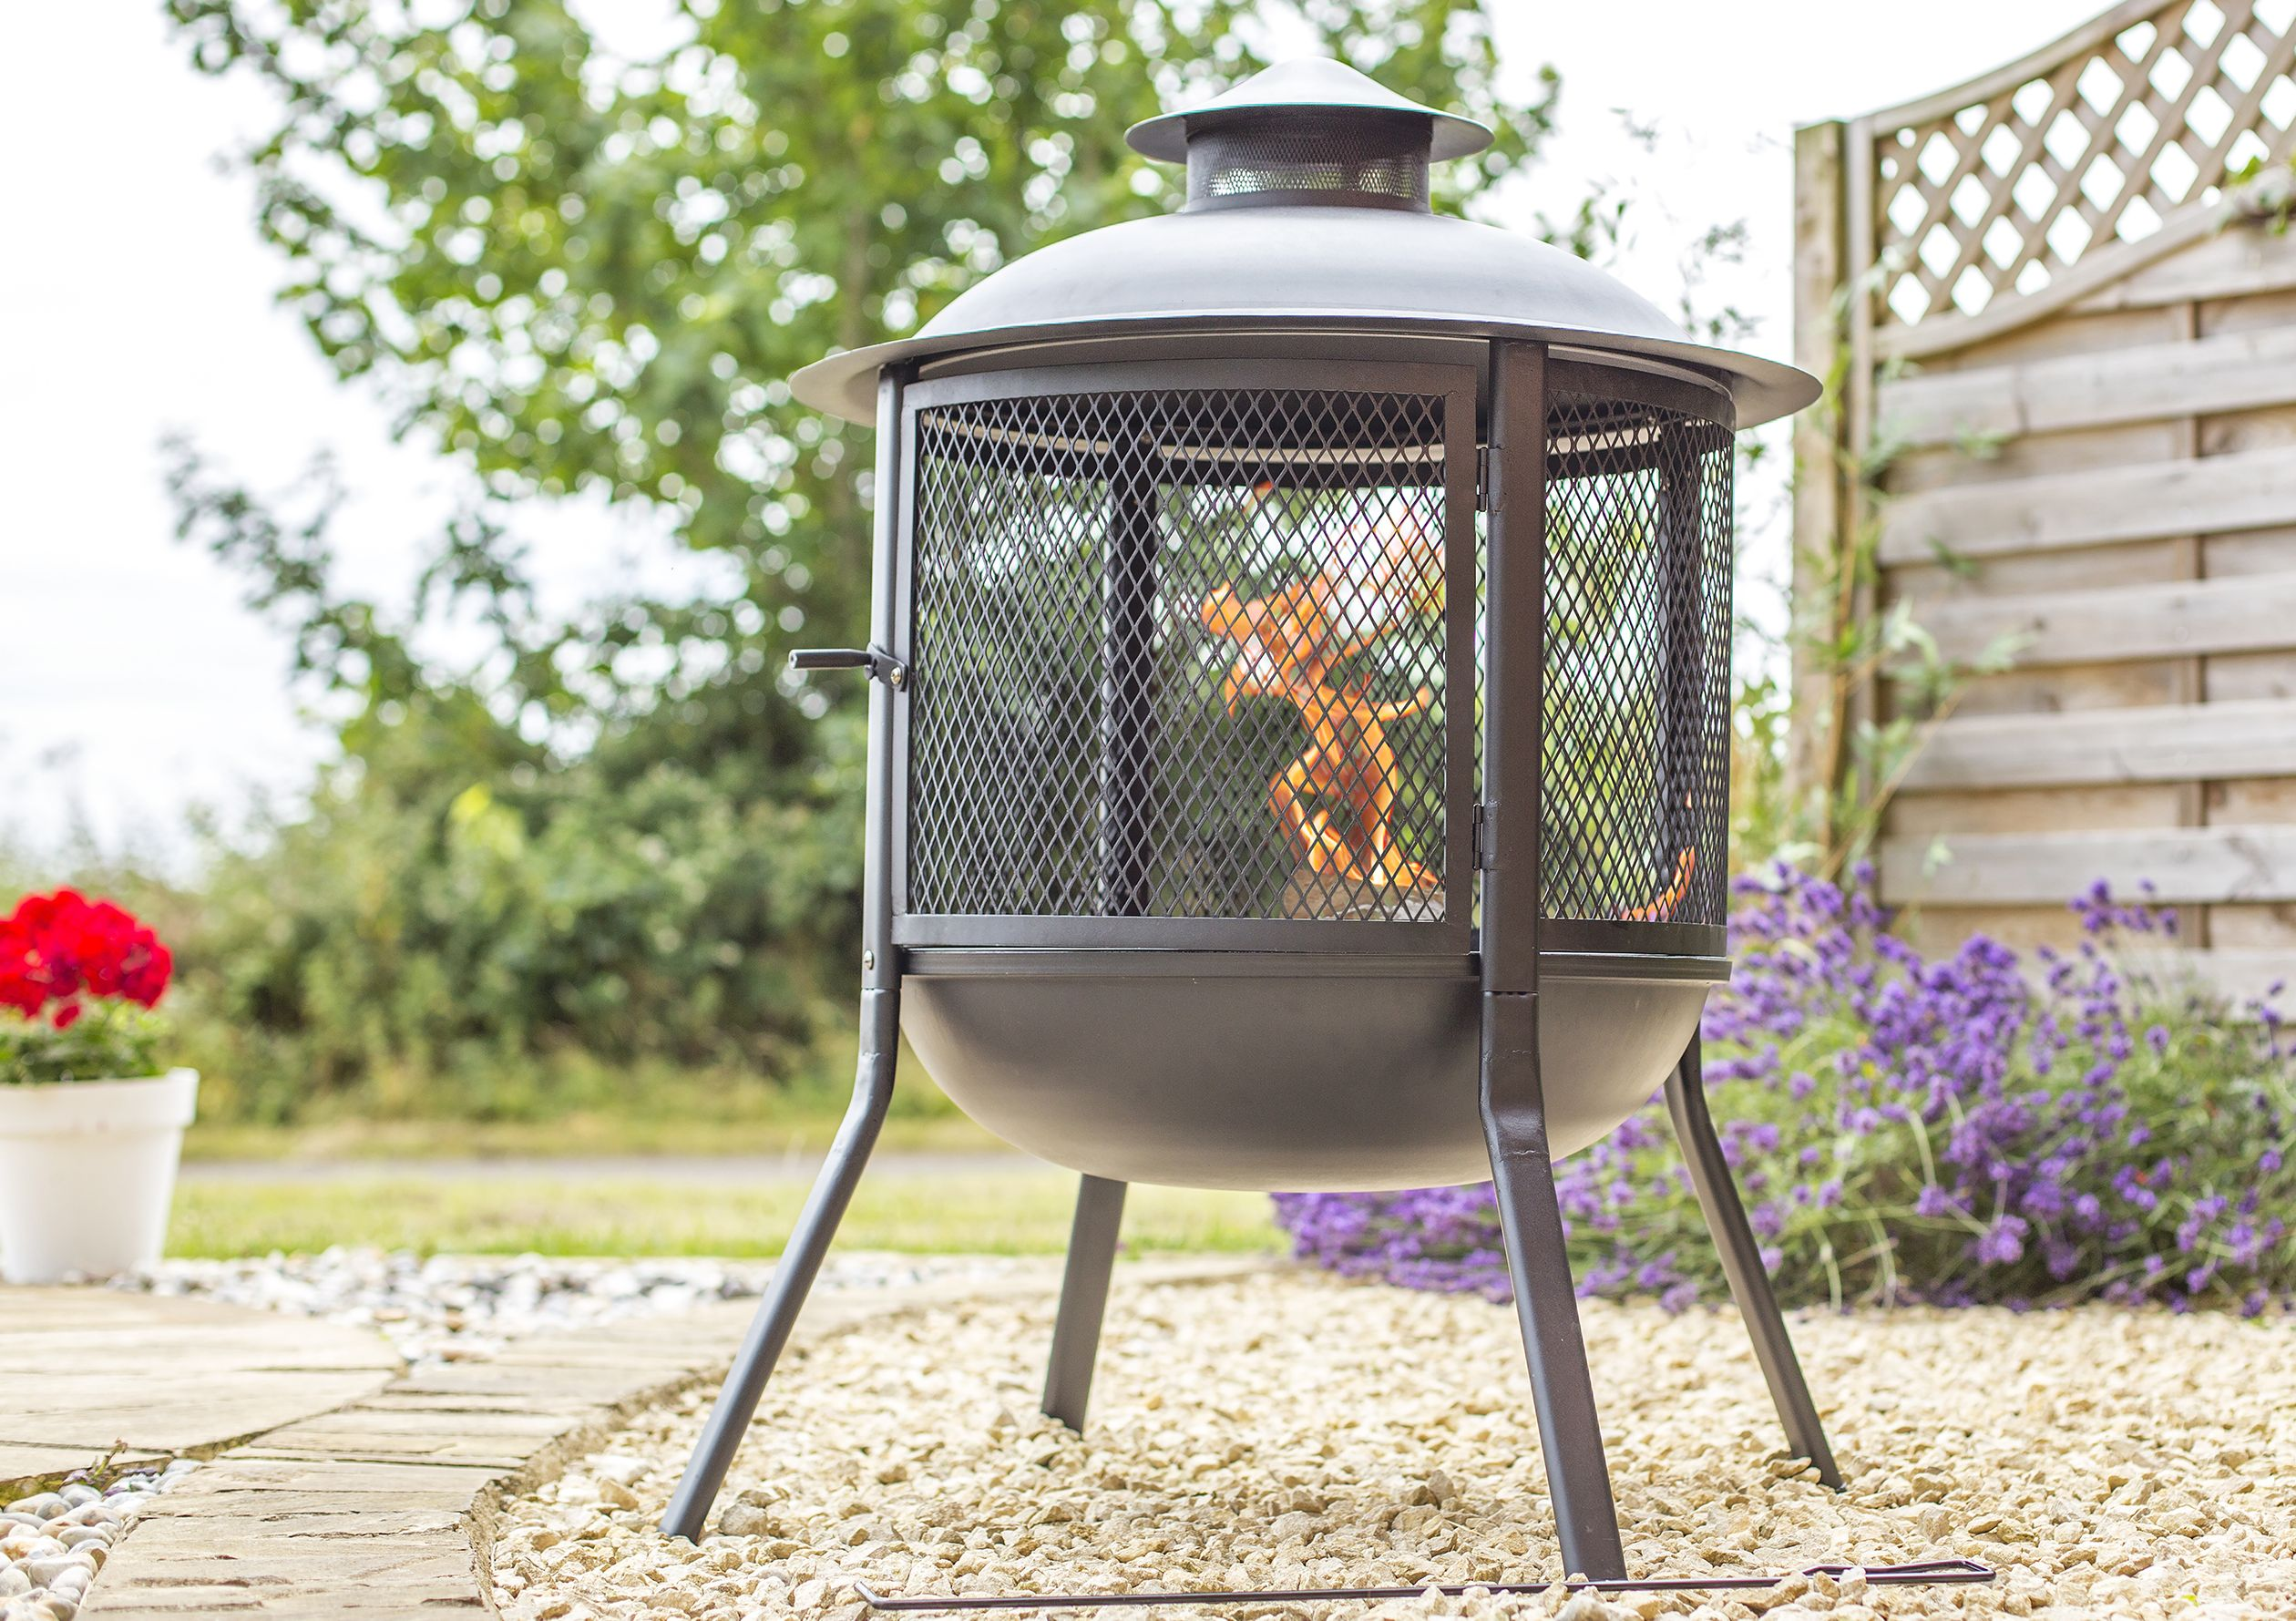 BBQs & Garden Furniture Garden Equipment